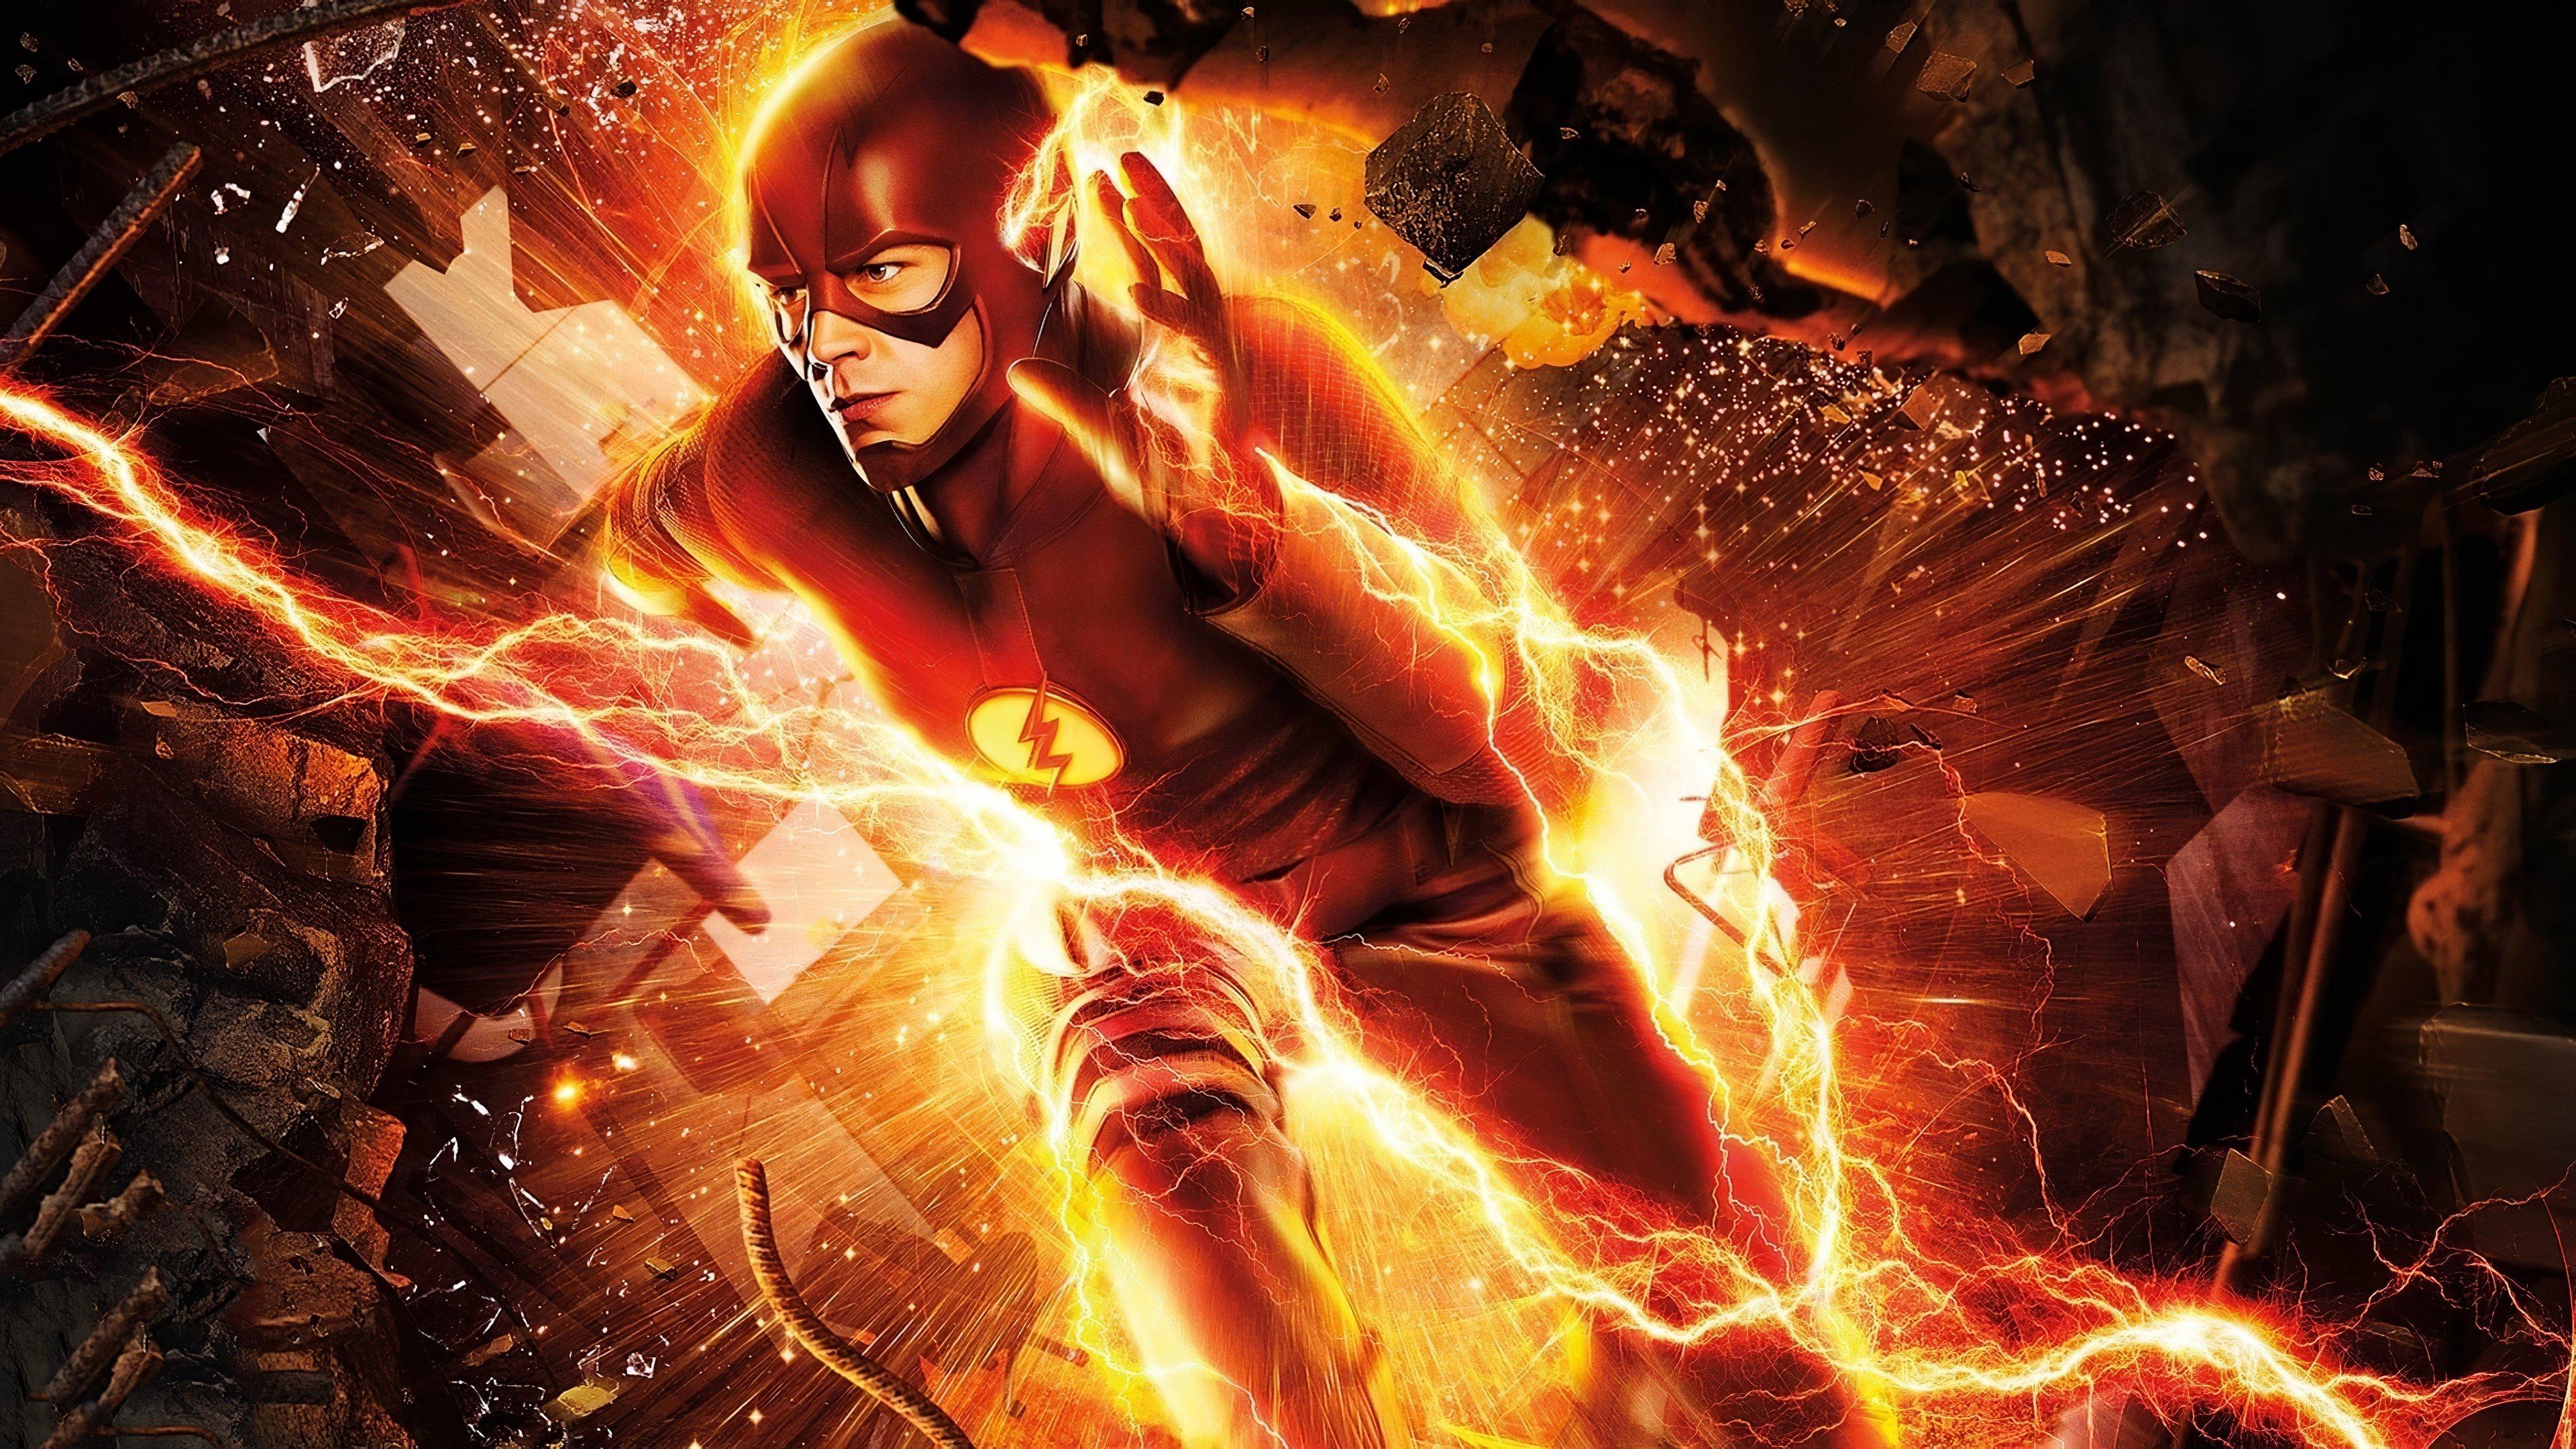 Wallpaper Gastin Gustin running as Flash